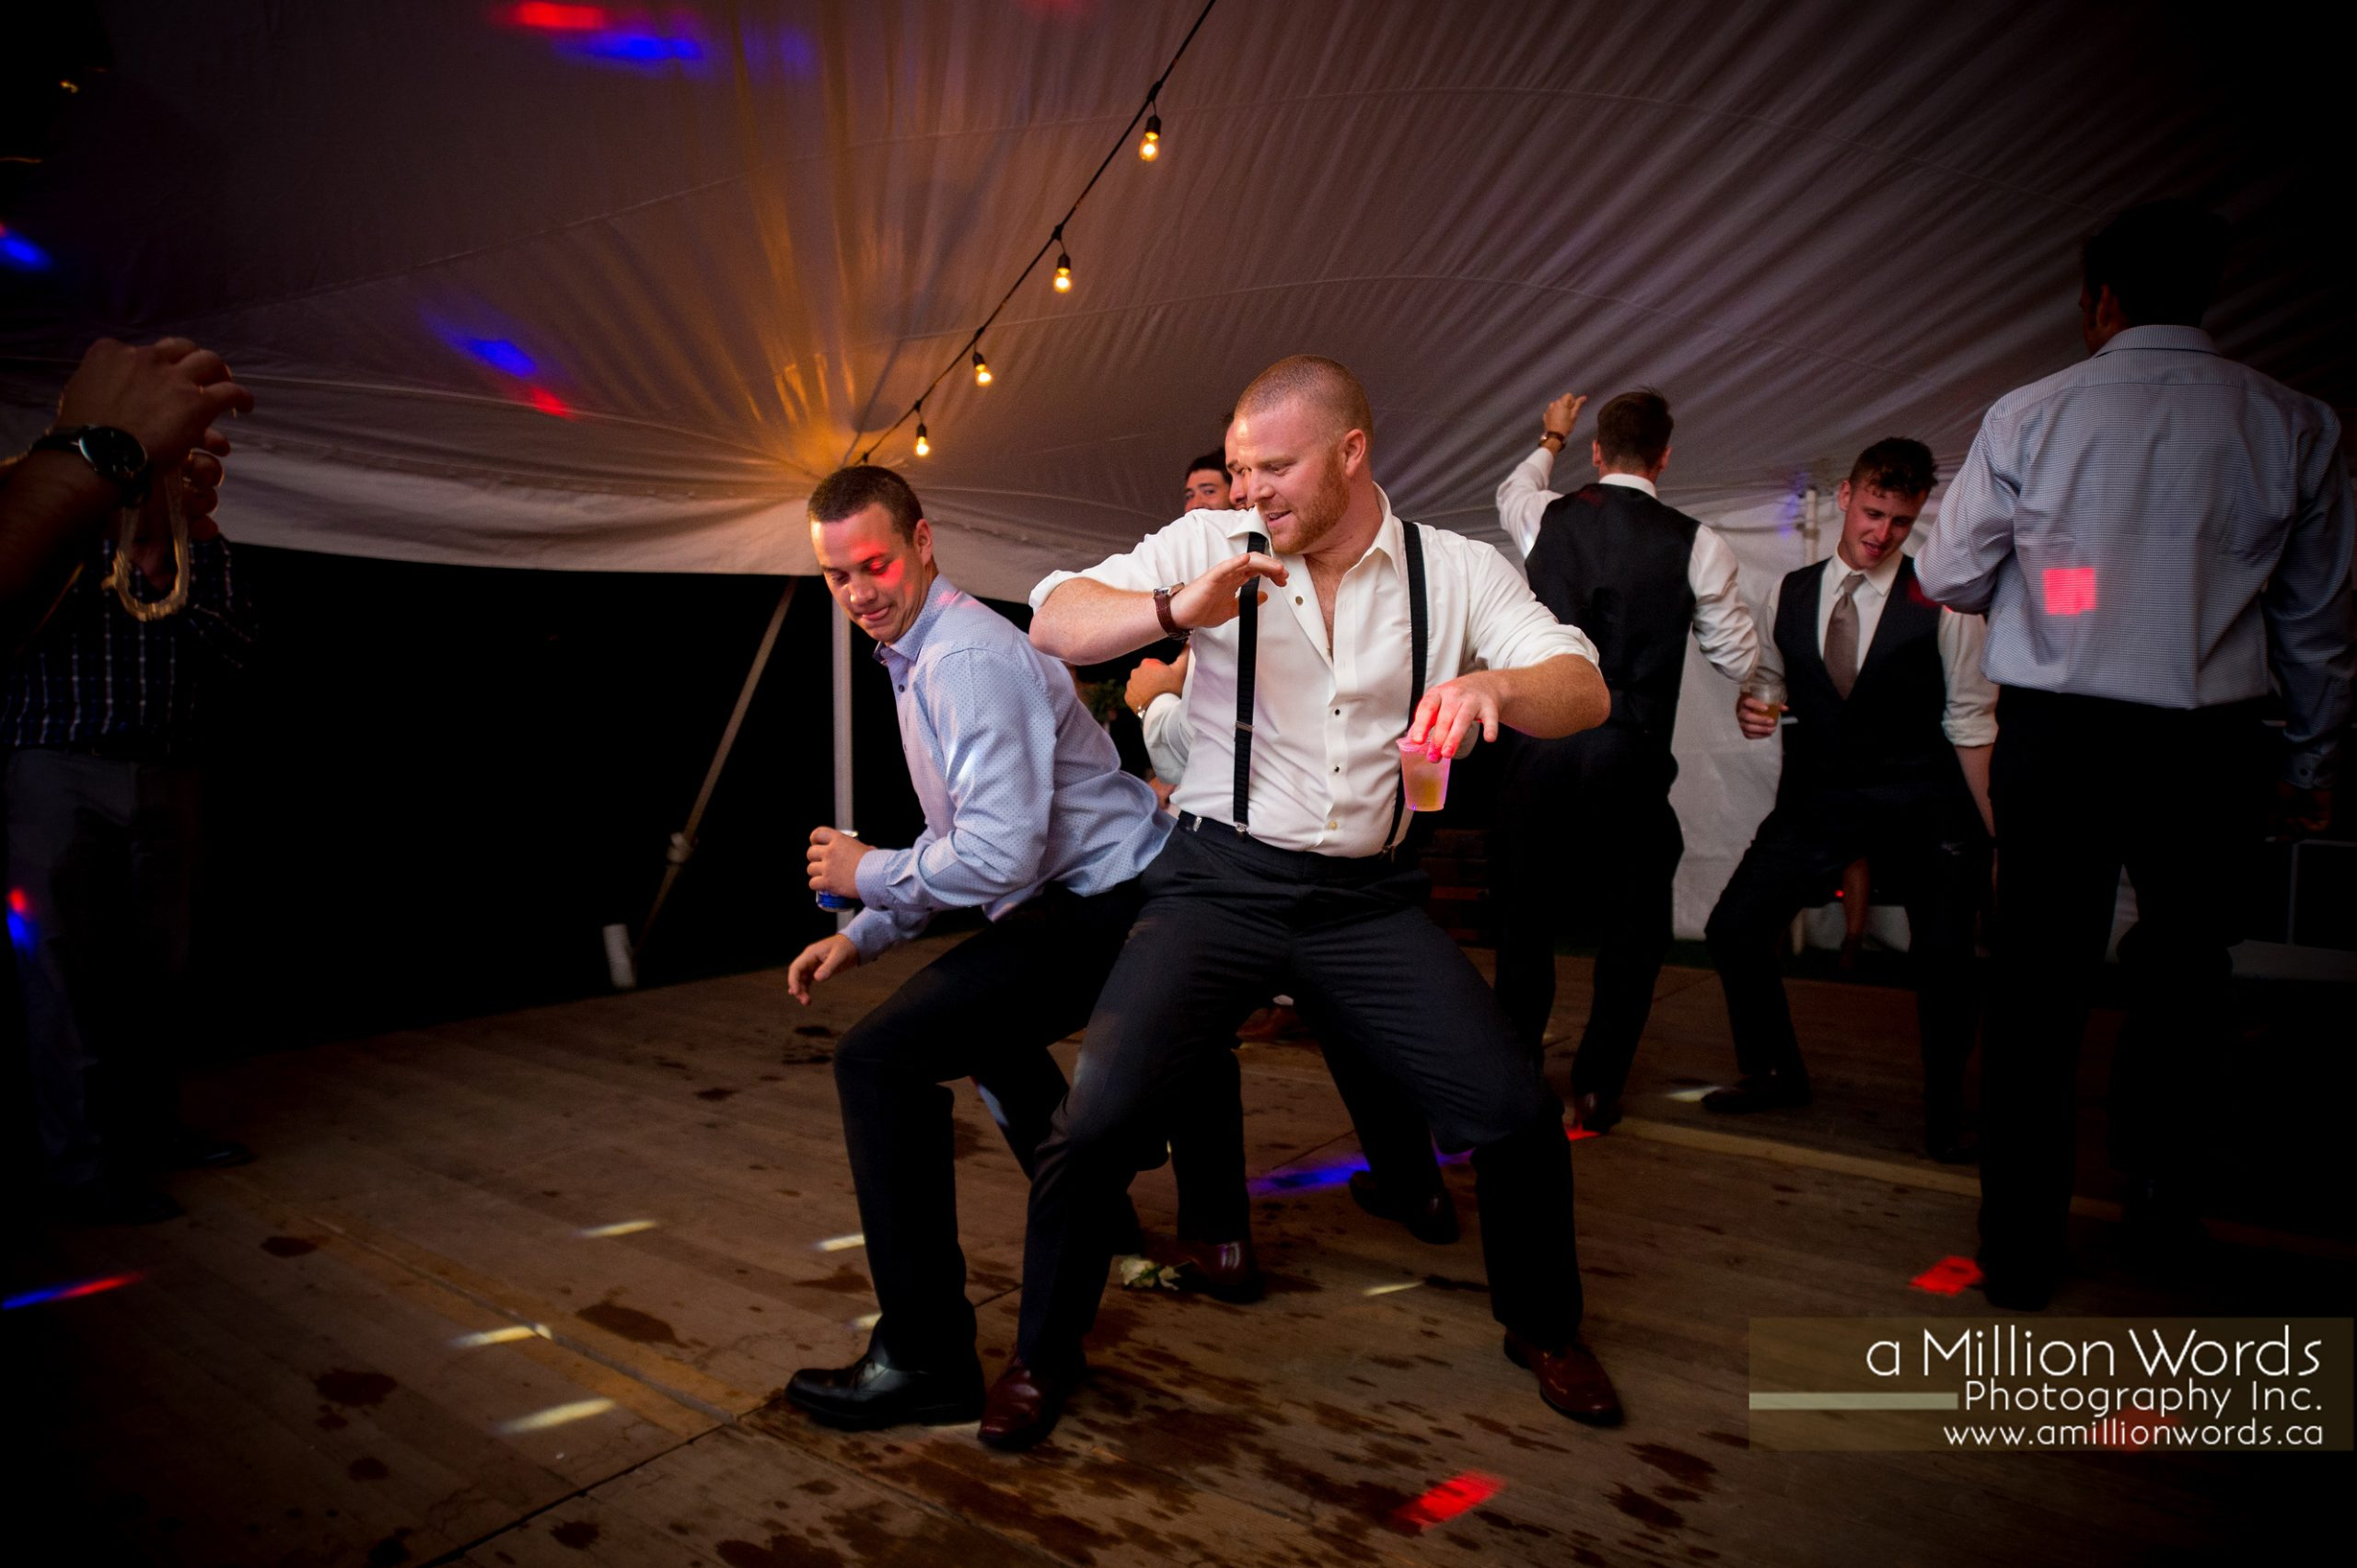 arthur_wedding_photographer87